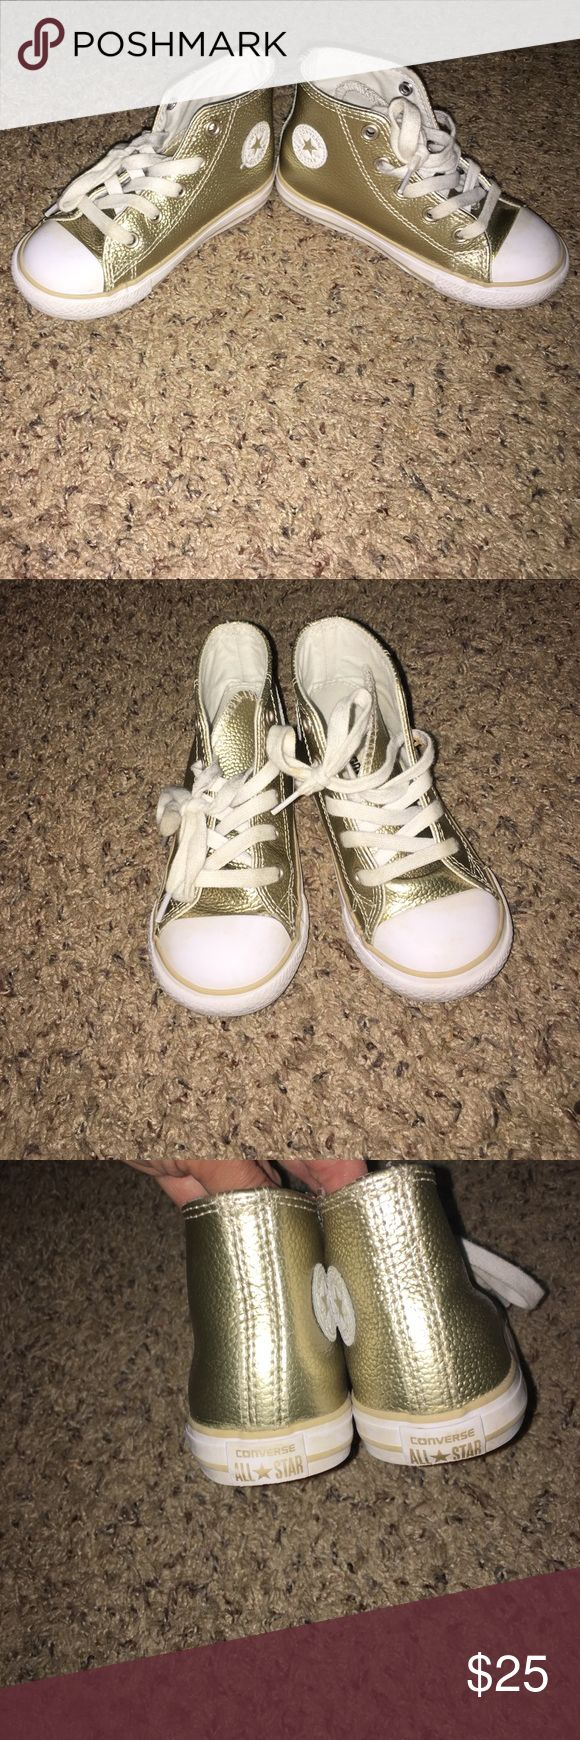 Toddler Converse, metallic gold high top US 8 Toddler Converse, metallic gold high top US 8 Converse Shoes Sneakers